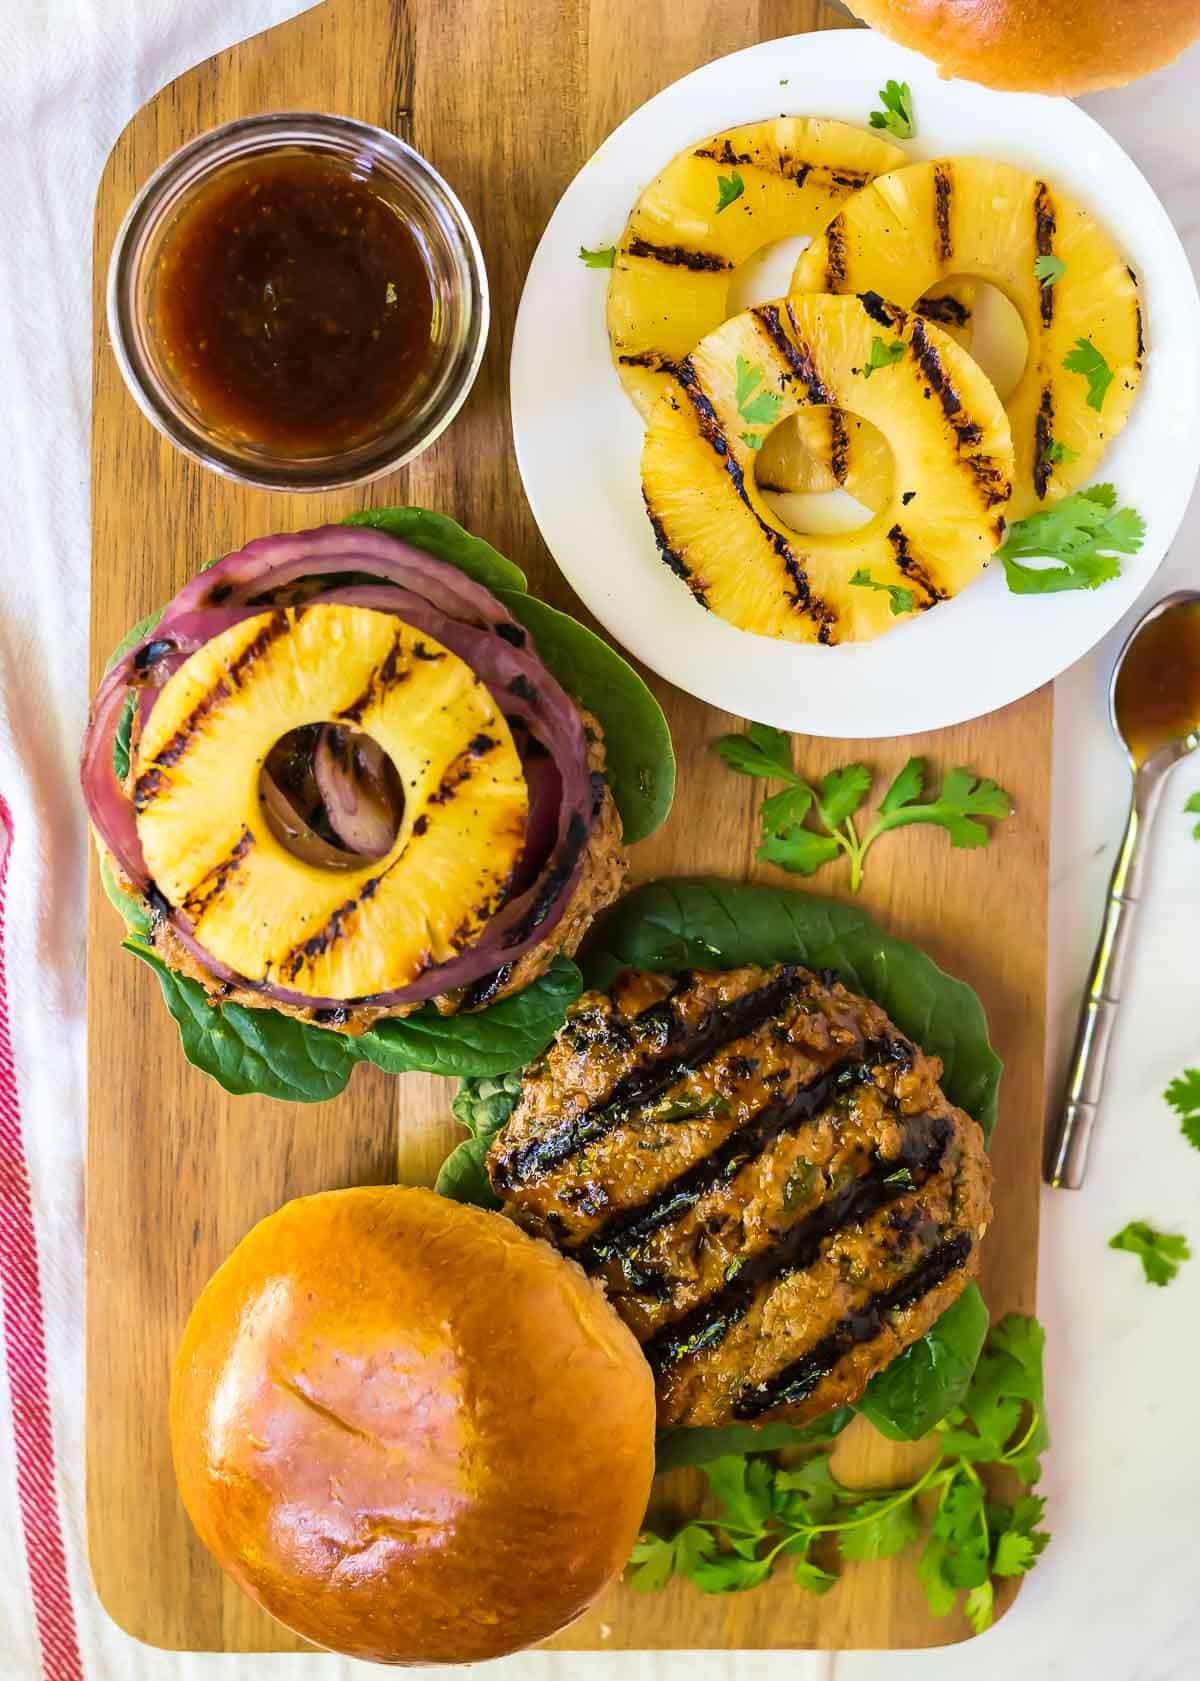 Hawaiian Teriyaki Burgers with Grilled Pineapple, Onion, and a sweet and savory teriyaki burger sauce. Recipe at wellplated.com | @wellplated